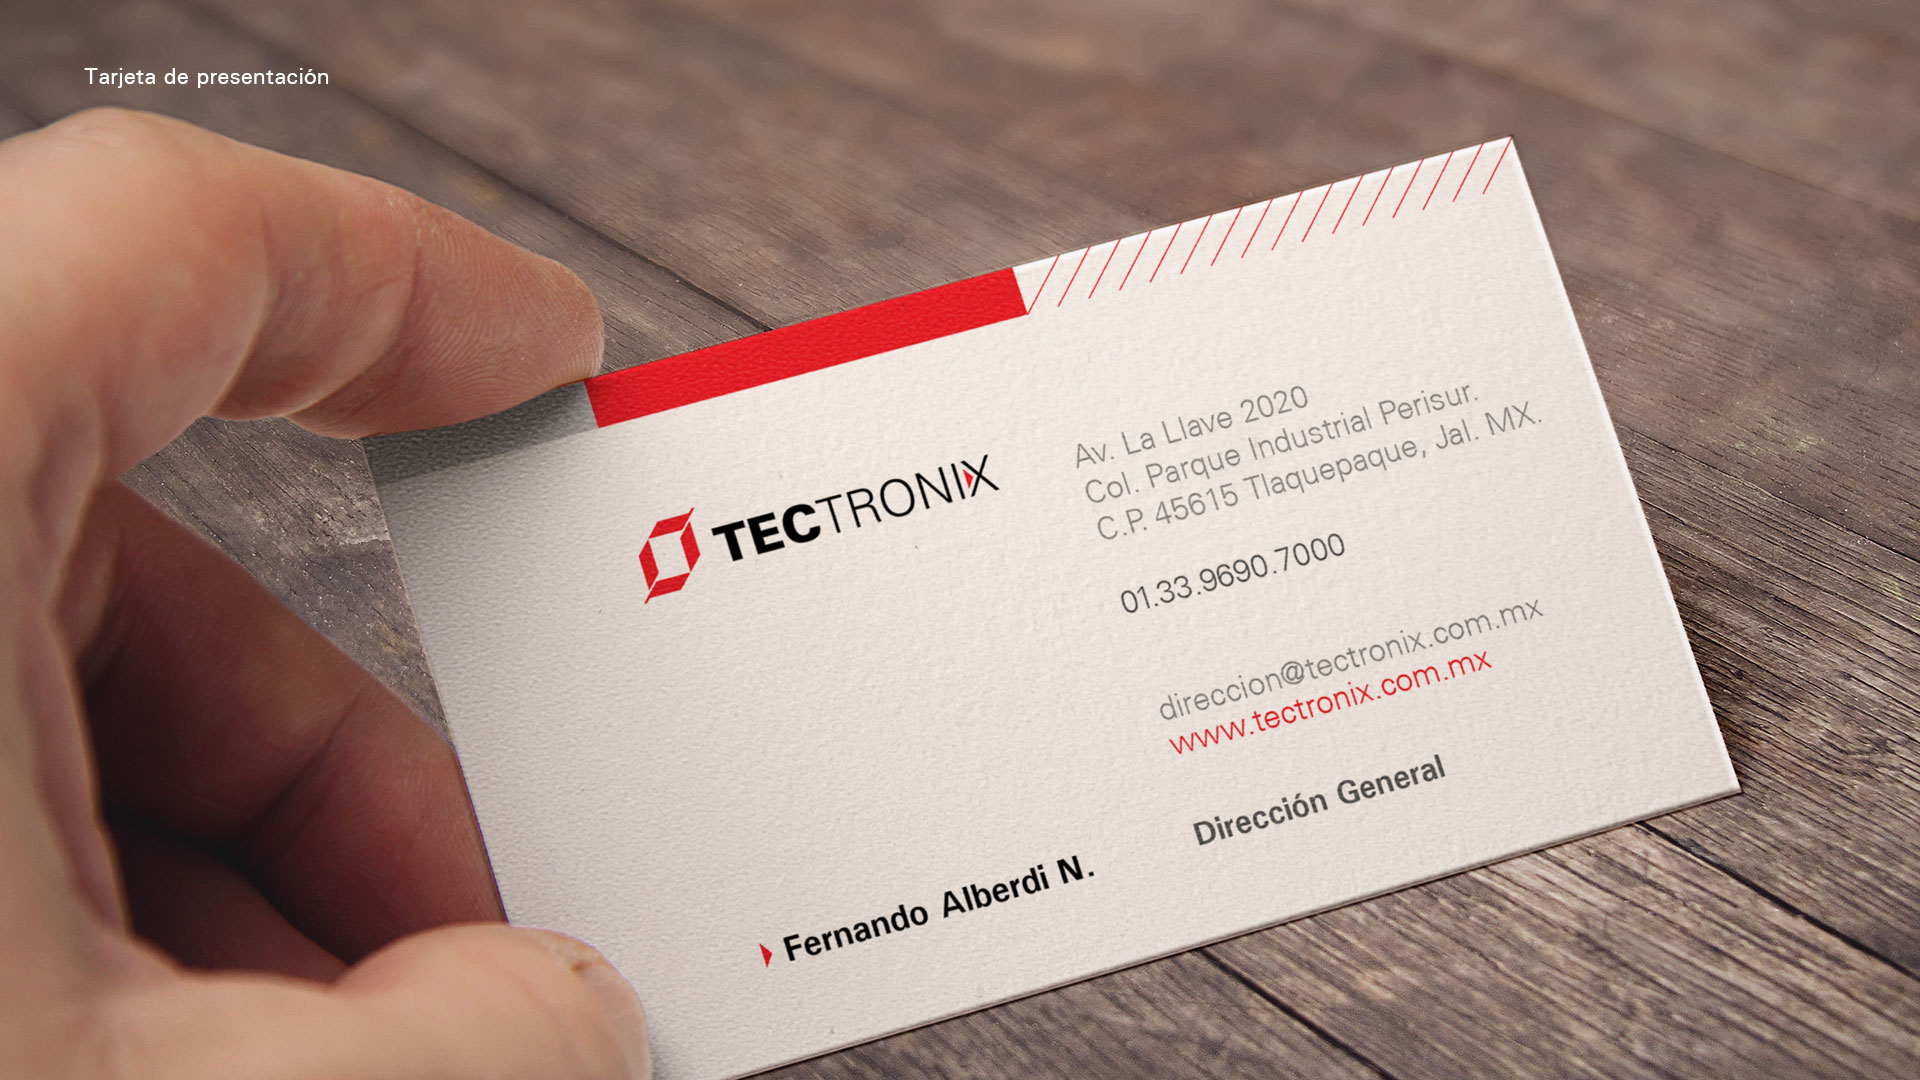 Identidad-corporativa-tectronix-tarjetas-presentacion